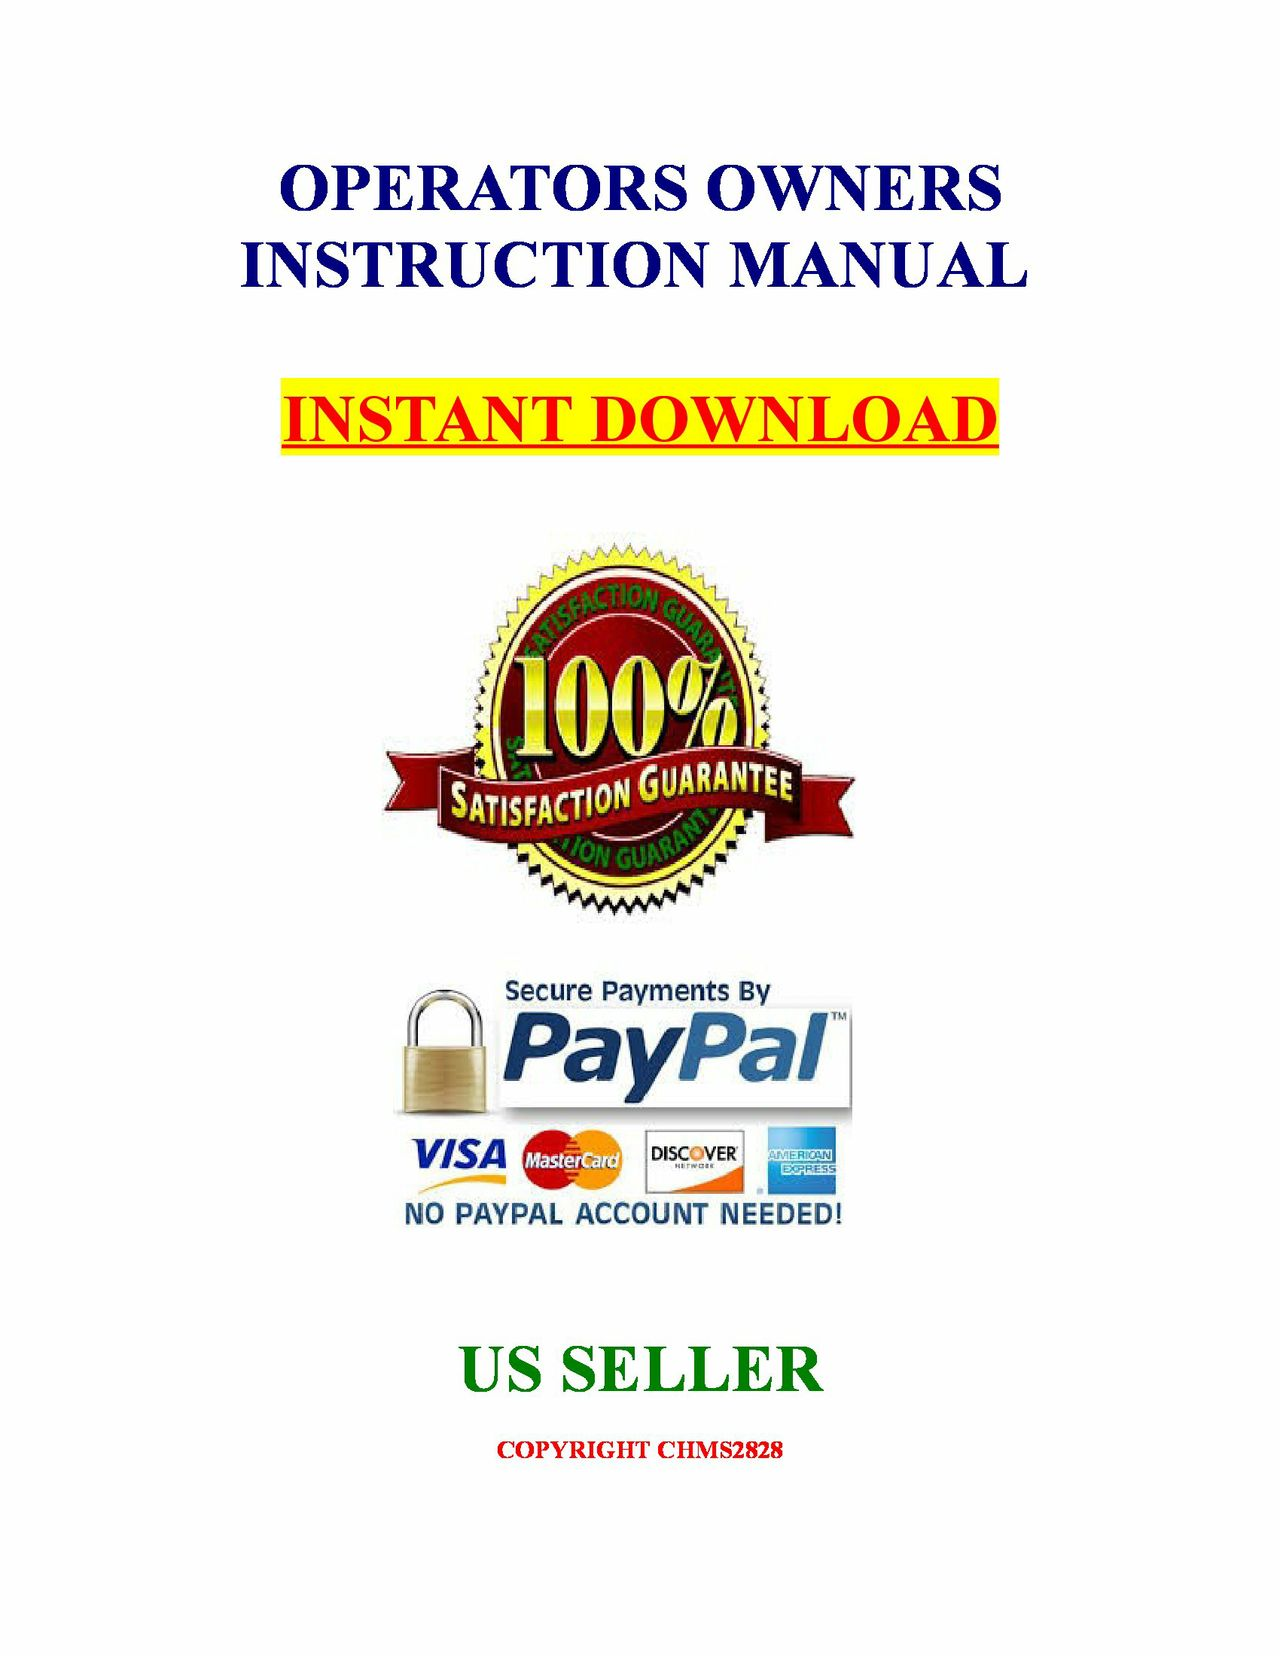 2007 dodge caliber service repair manual free download kubota tractor l2900 l3300 l3600 l4200 operators instruction owners manual guide sciox Images